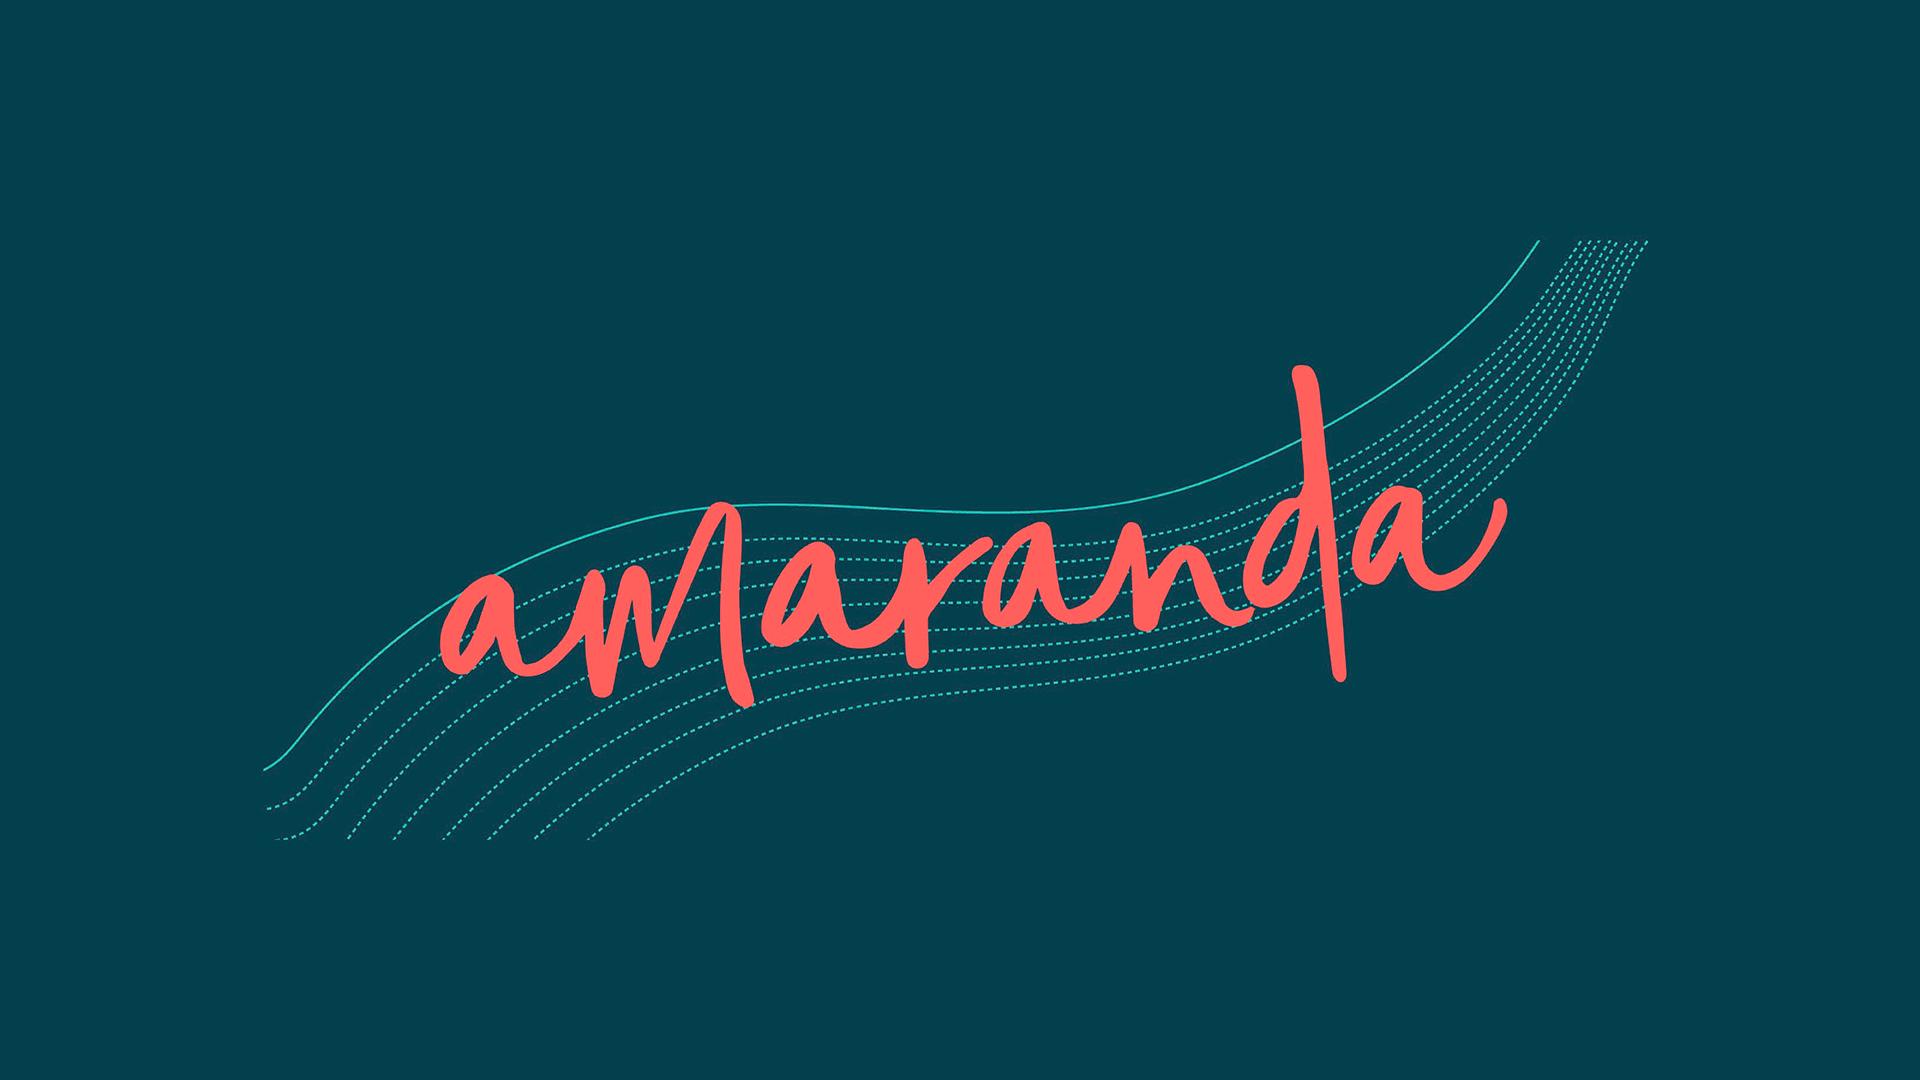 amaranda-branding